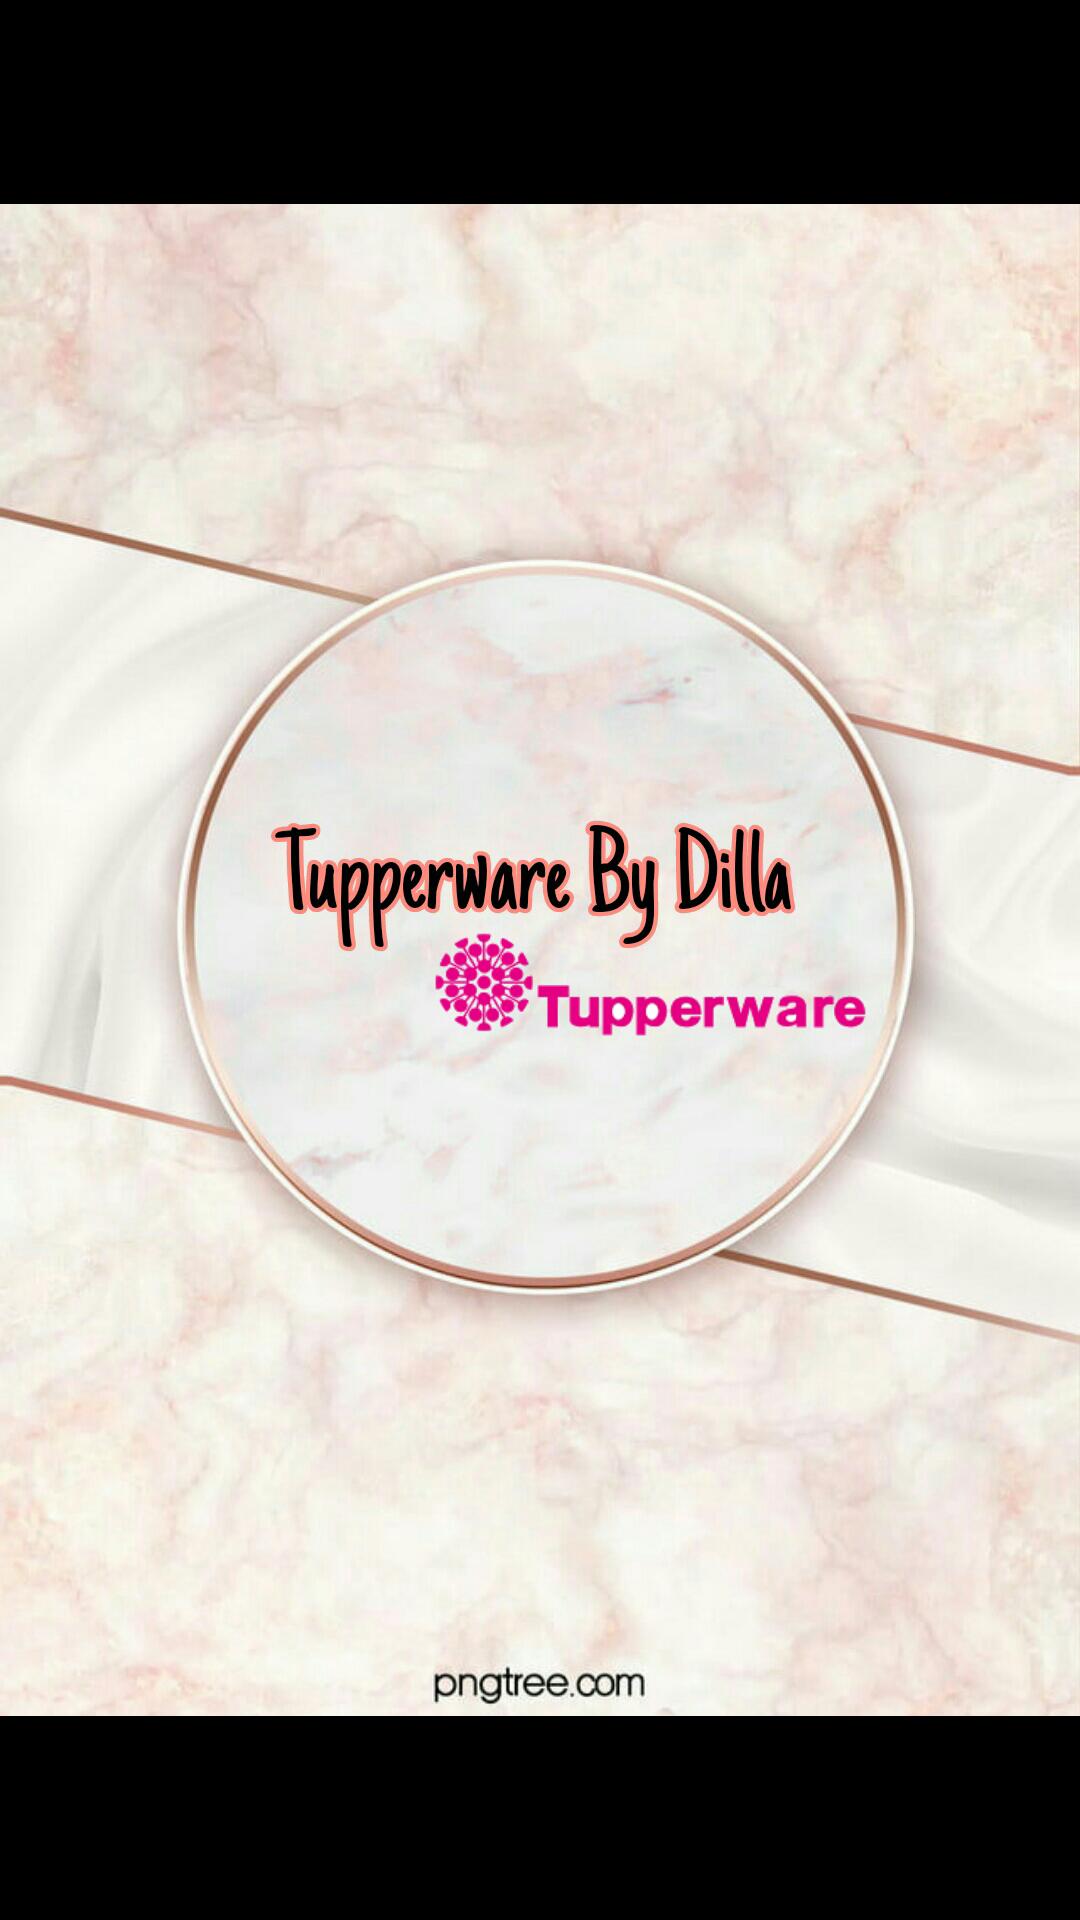 Tupperware By Dilla